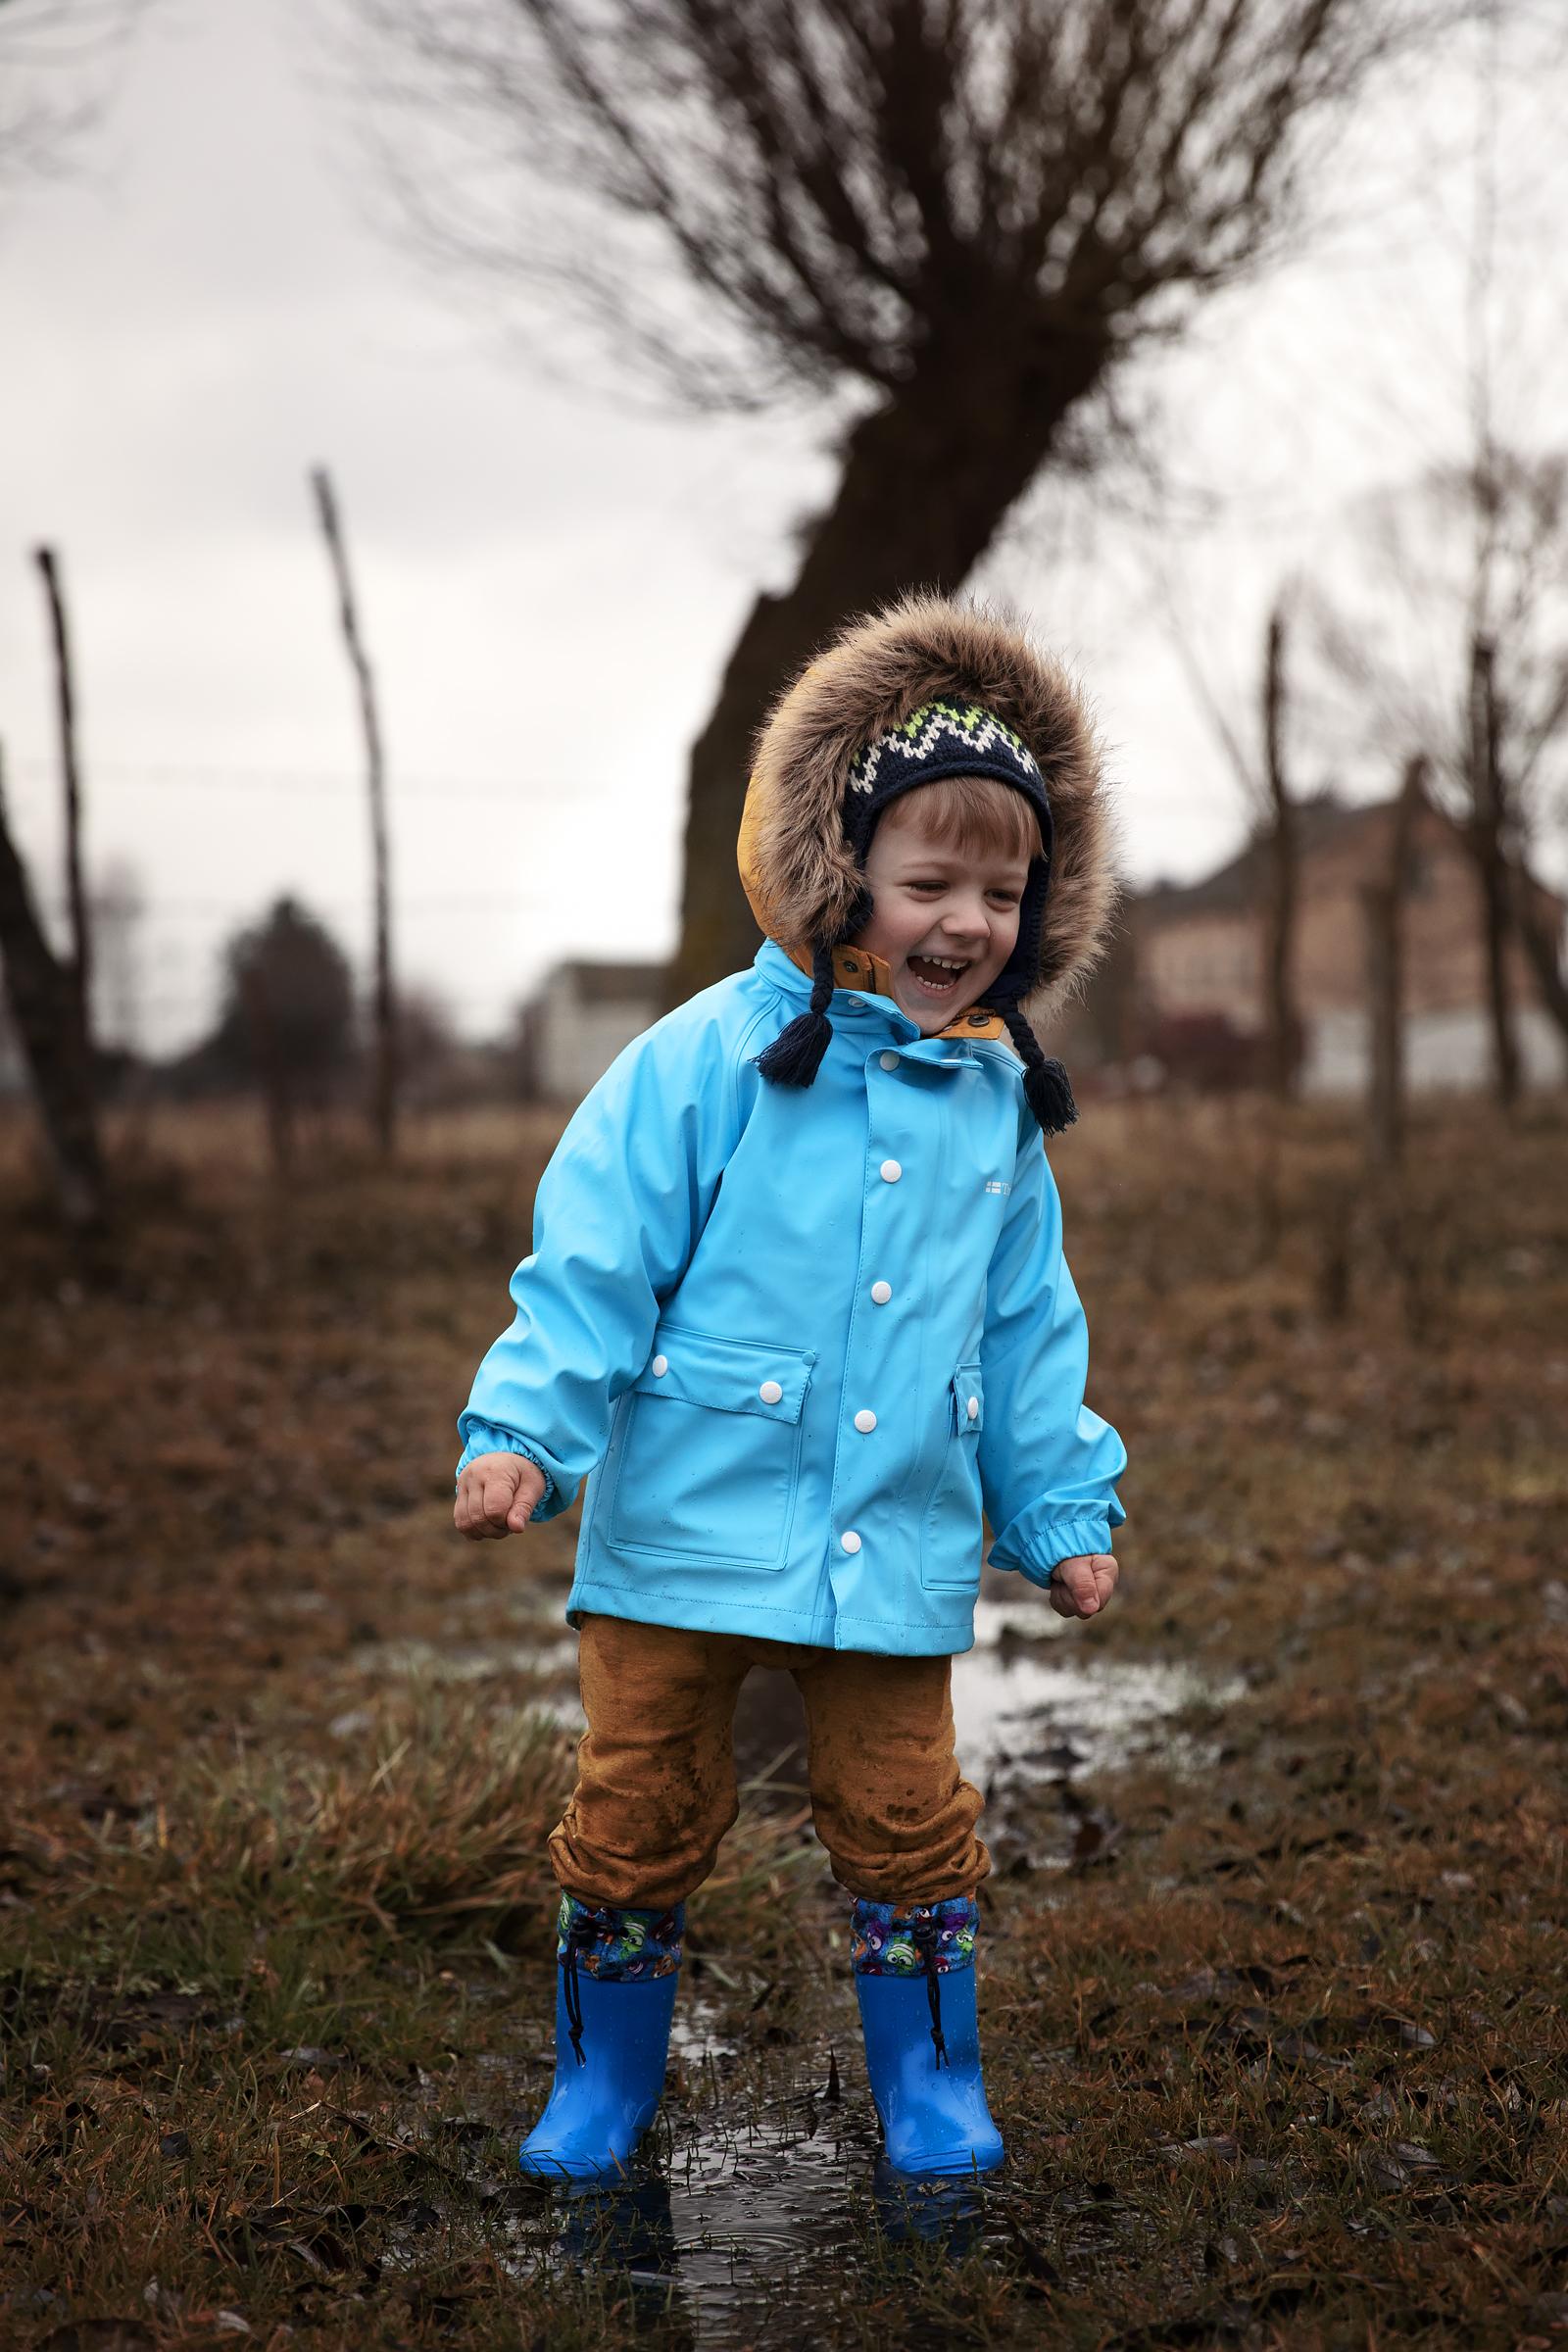 najpopularniejszy-blog-parentingowy-sanostol16